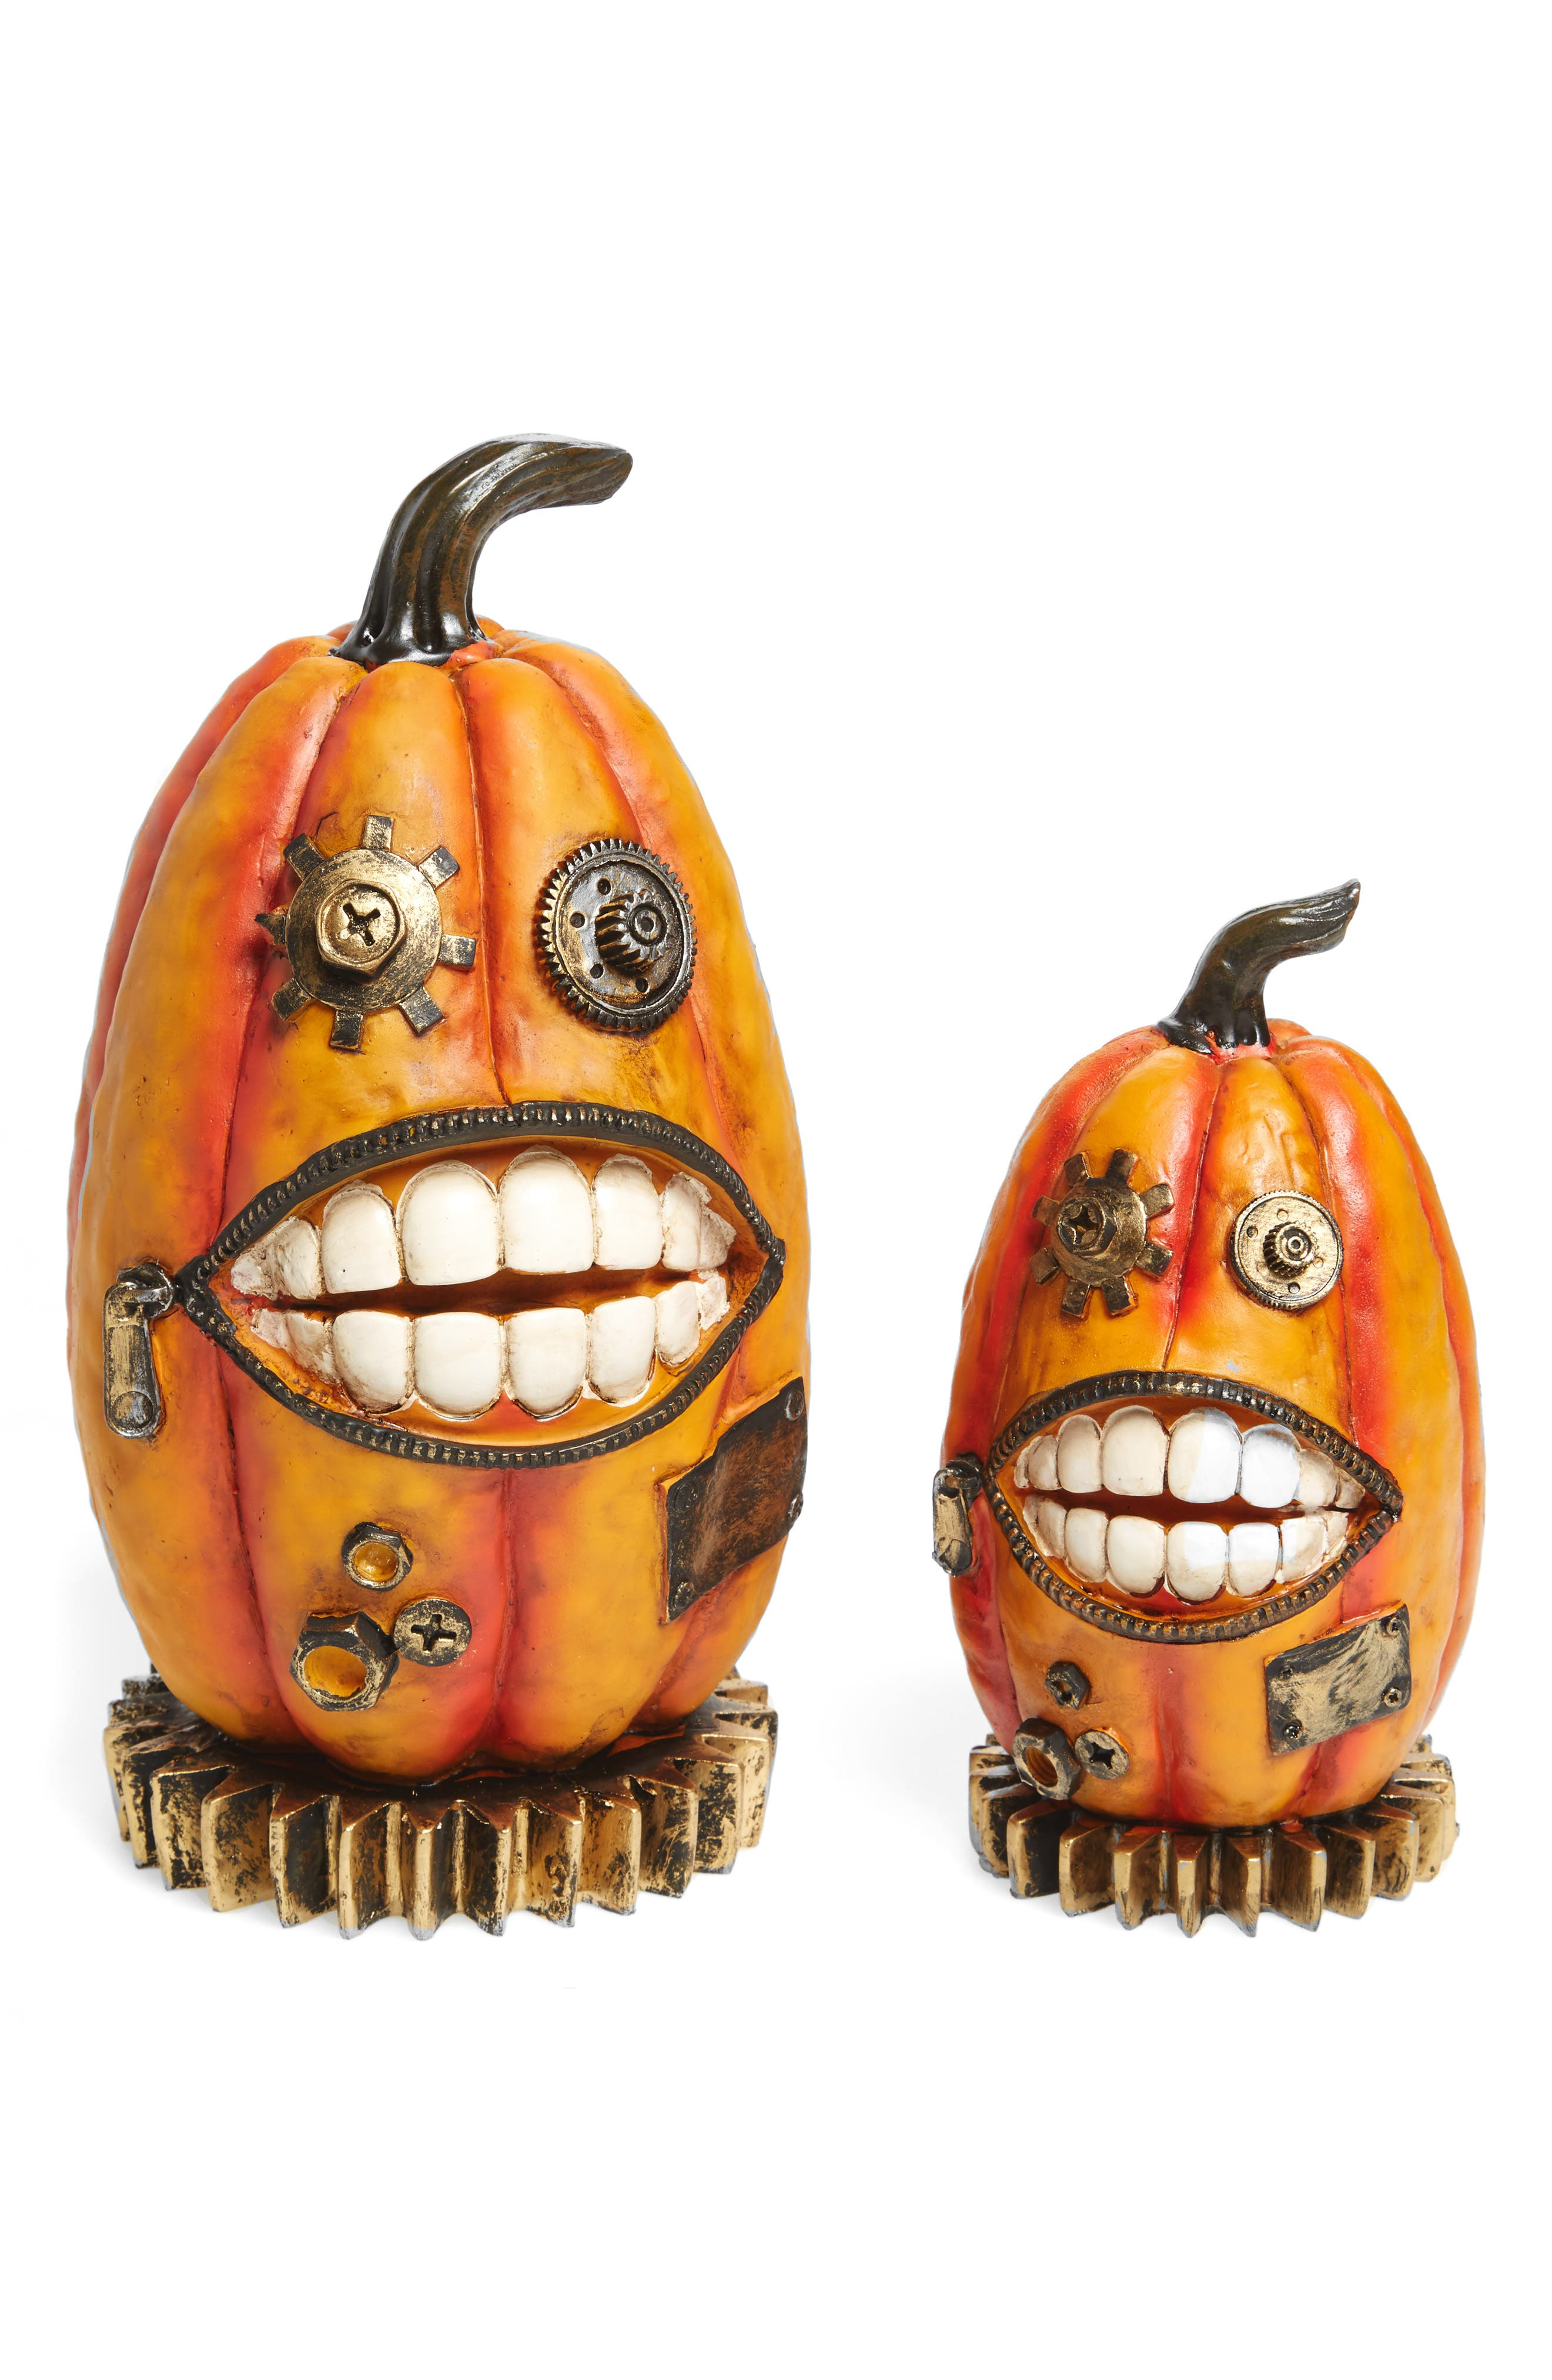 Fantastic Craft Steampunk Pumpkin